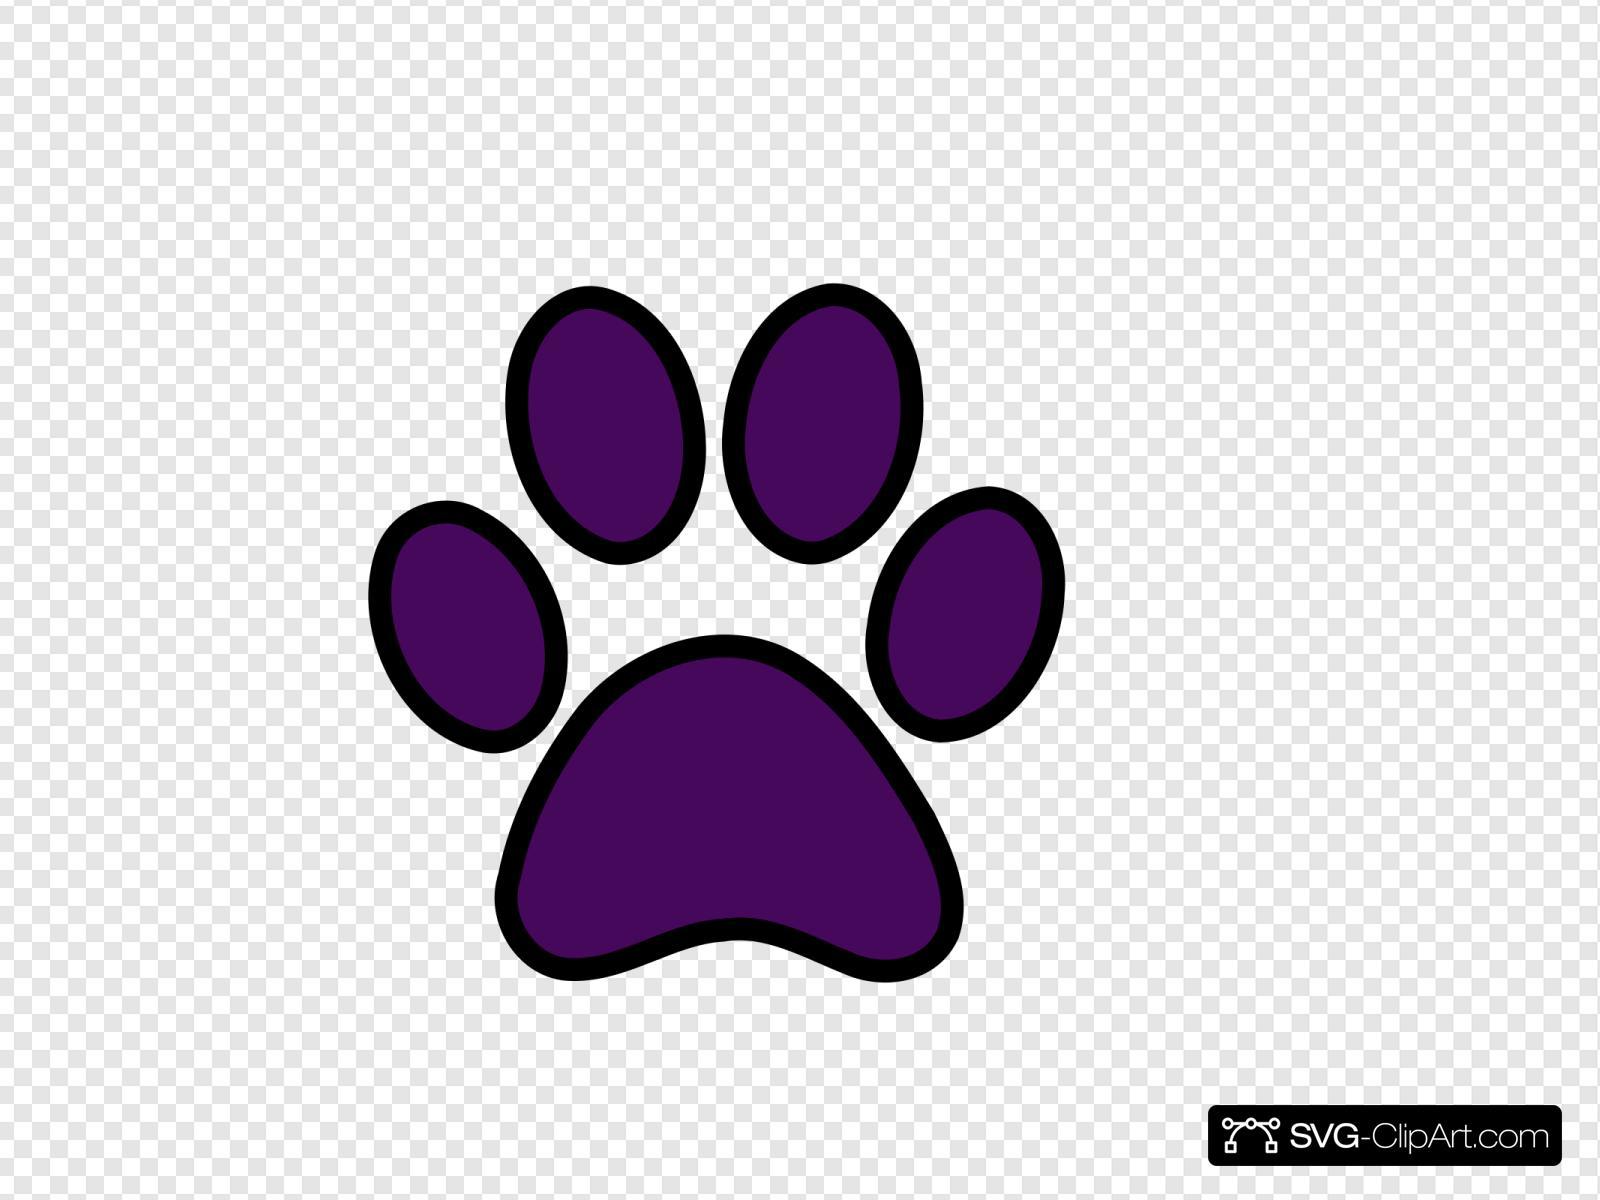 Purple Pawprint Black Outline Clip art, Icon and SVG - SVG